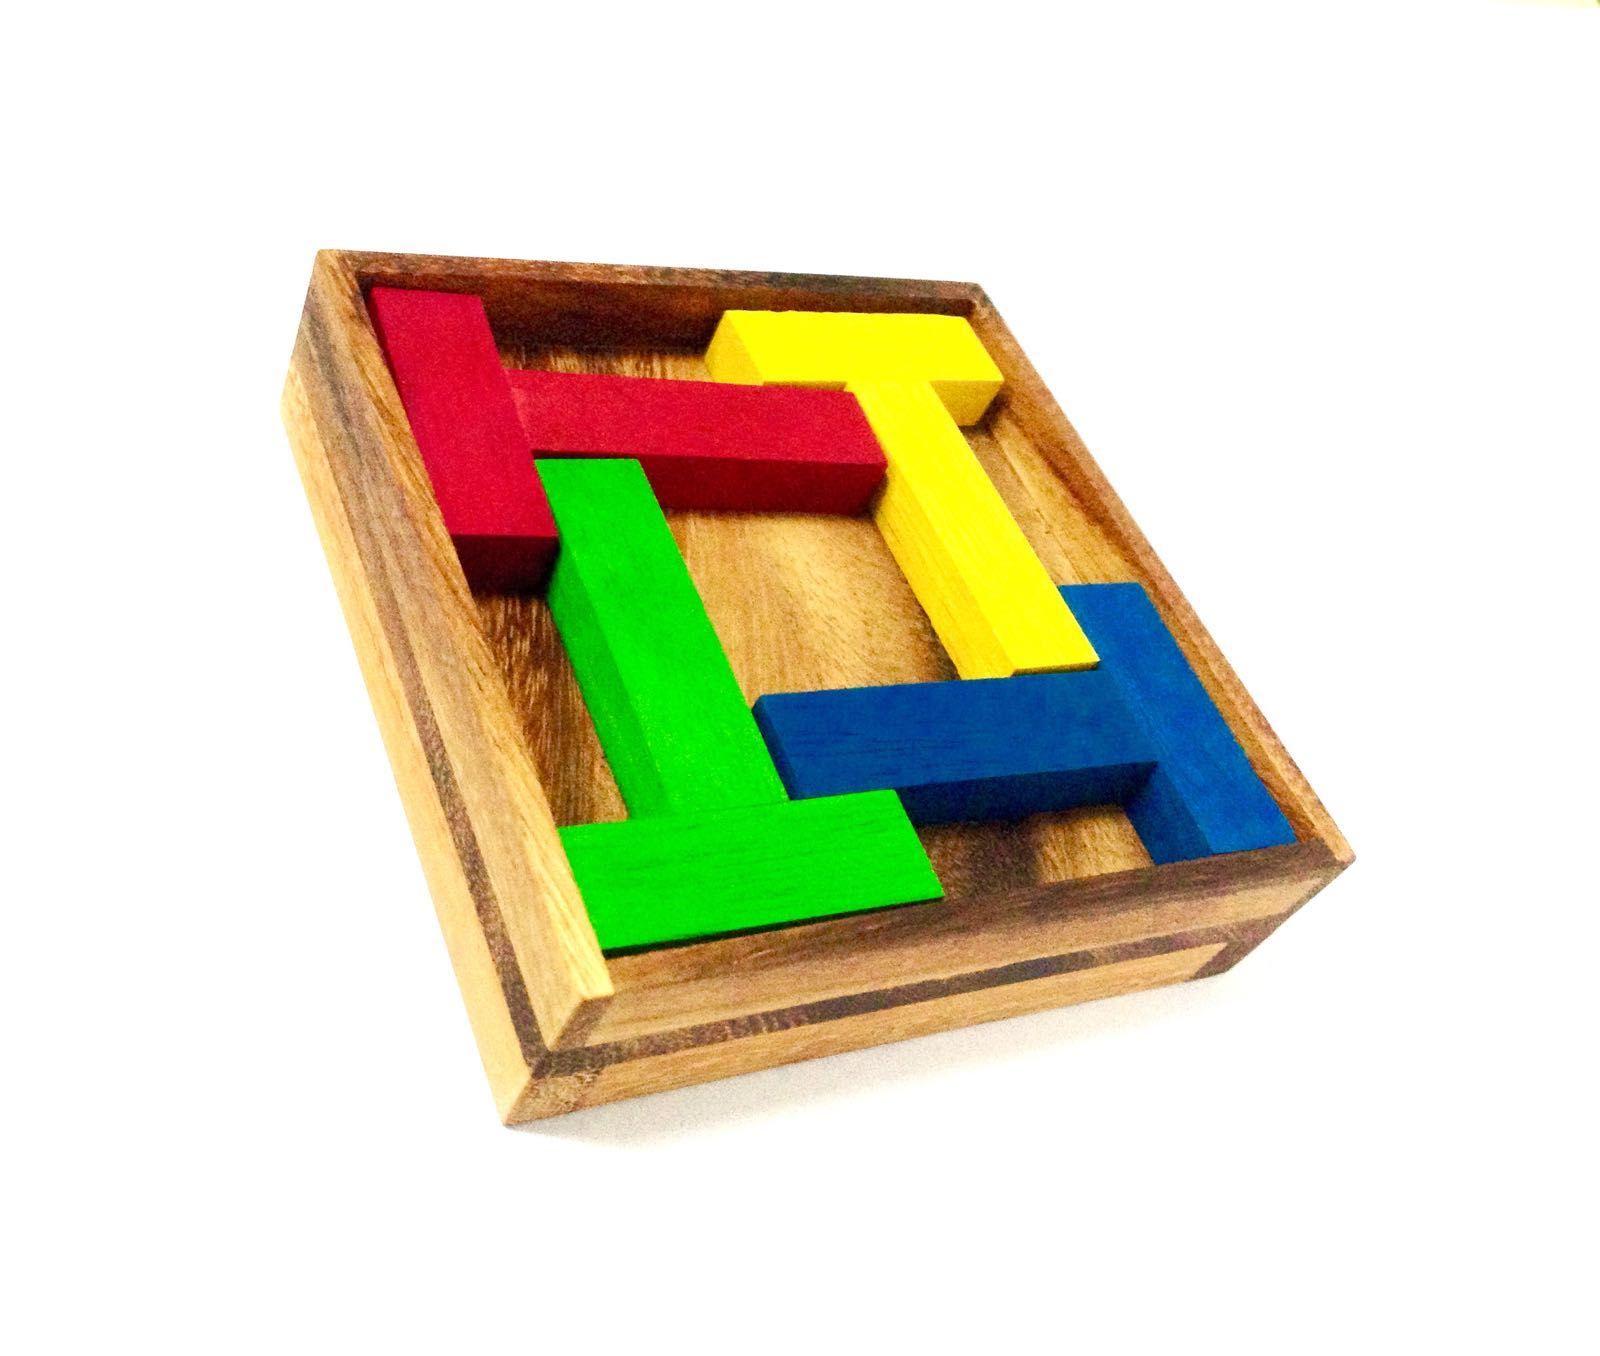 Puzzle Inteligente de Madera 4T Puzzle 5 Rompecabezas 1 LOGICA GIOCHI Art